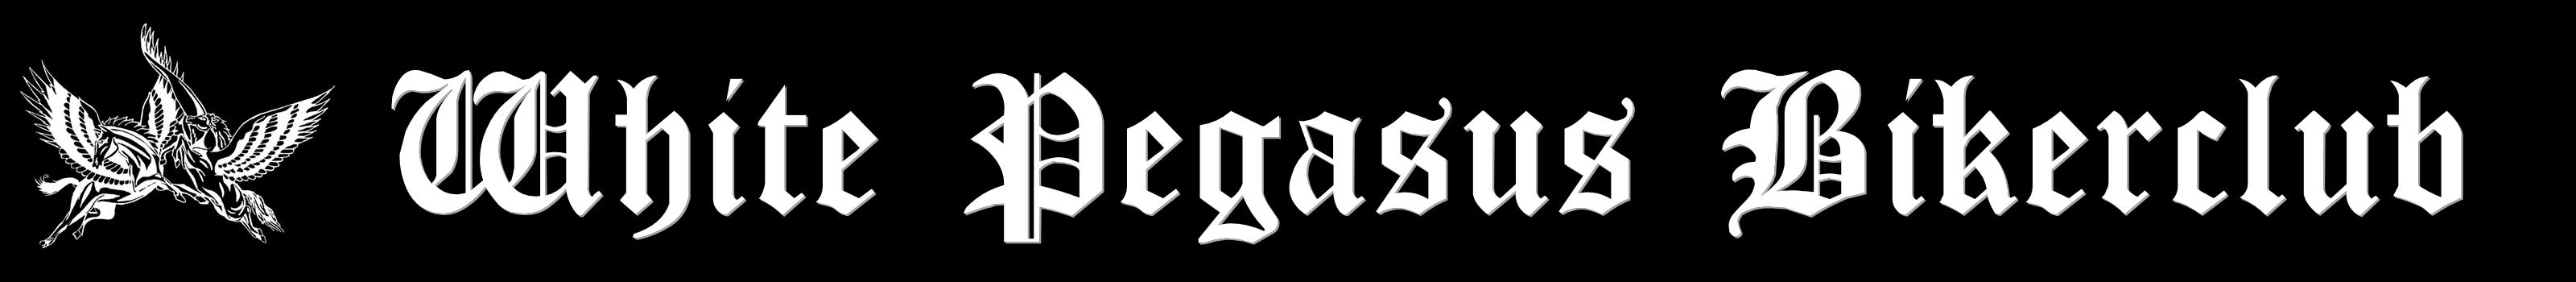 White Pegasus Bikerclub